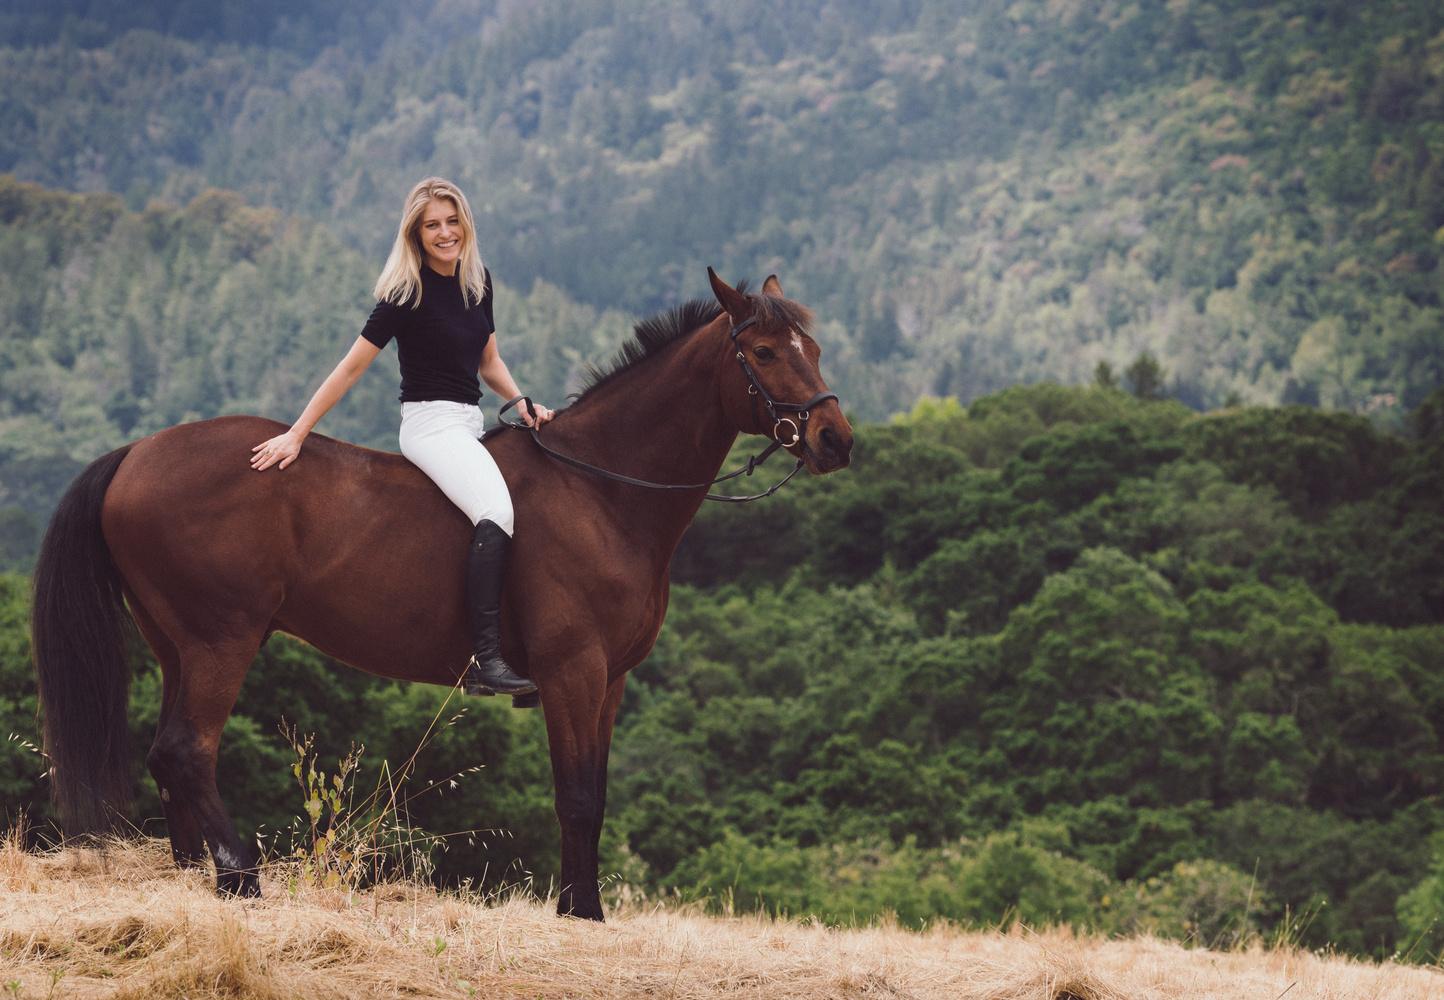 The Equestrian by Oksana Kemp